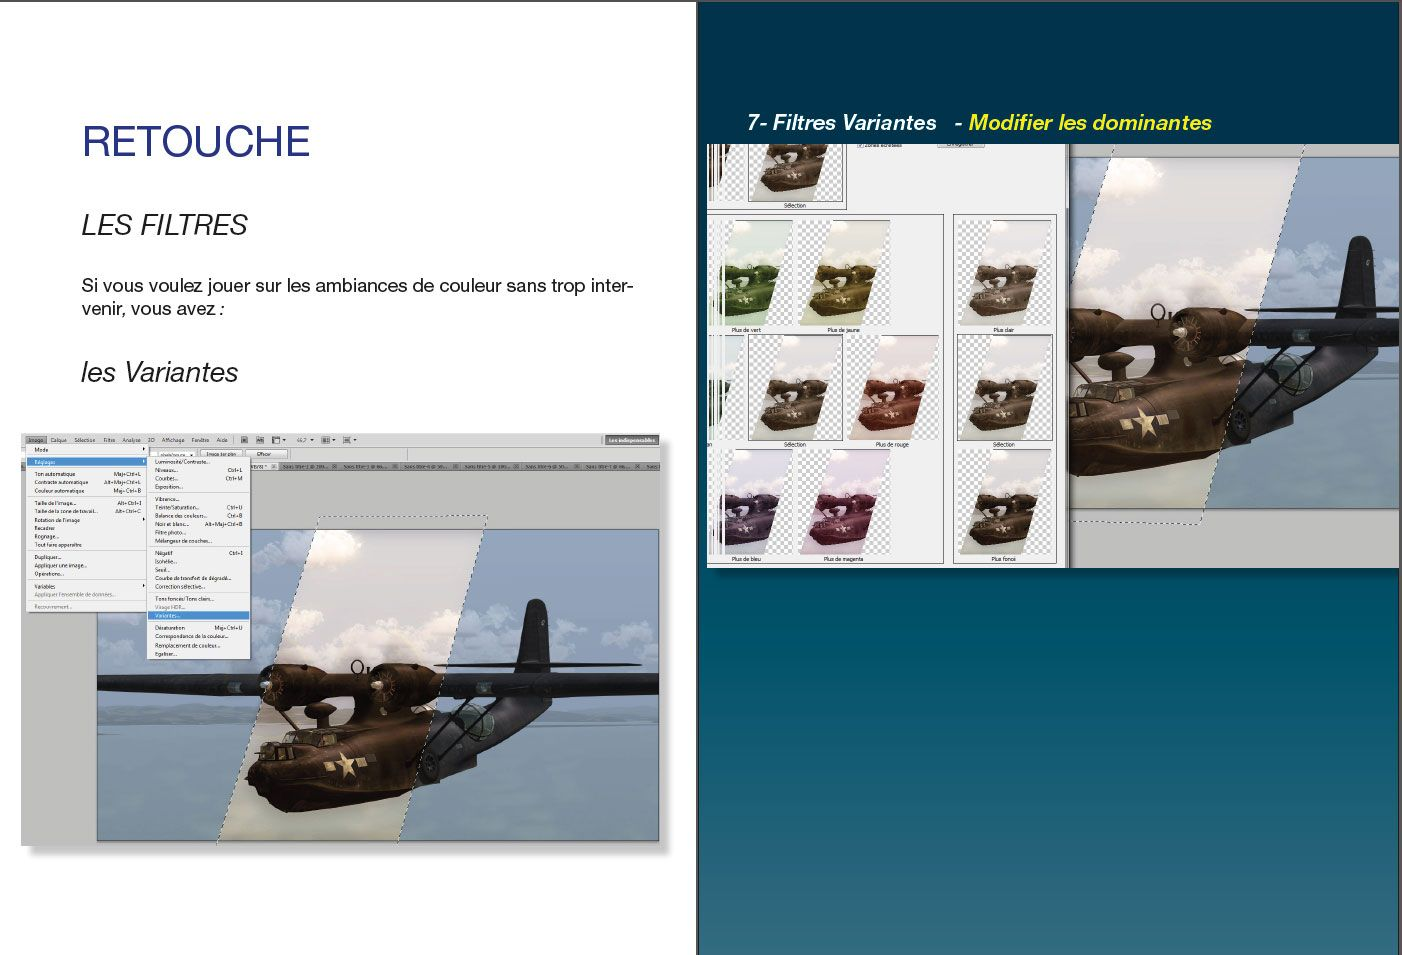 http://img43.imageshack.us/img43/558/tutoretouche111.jpg